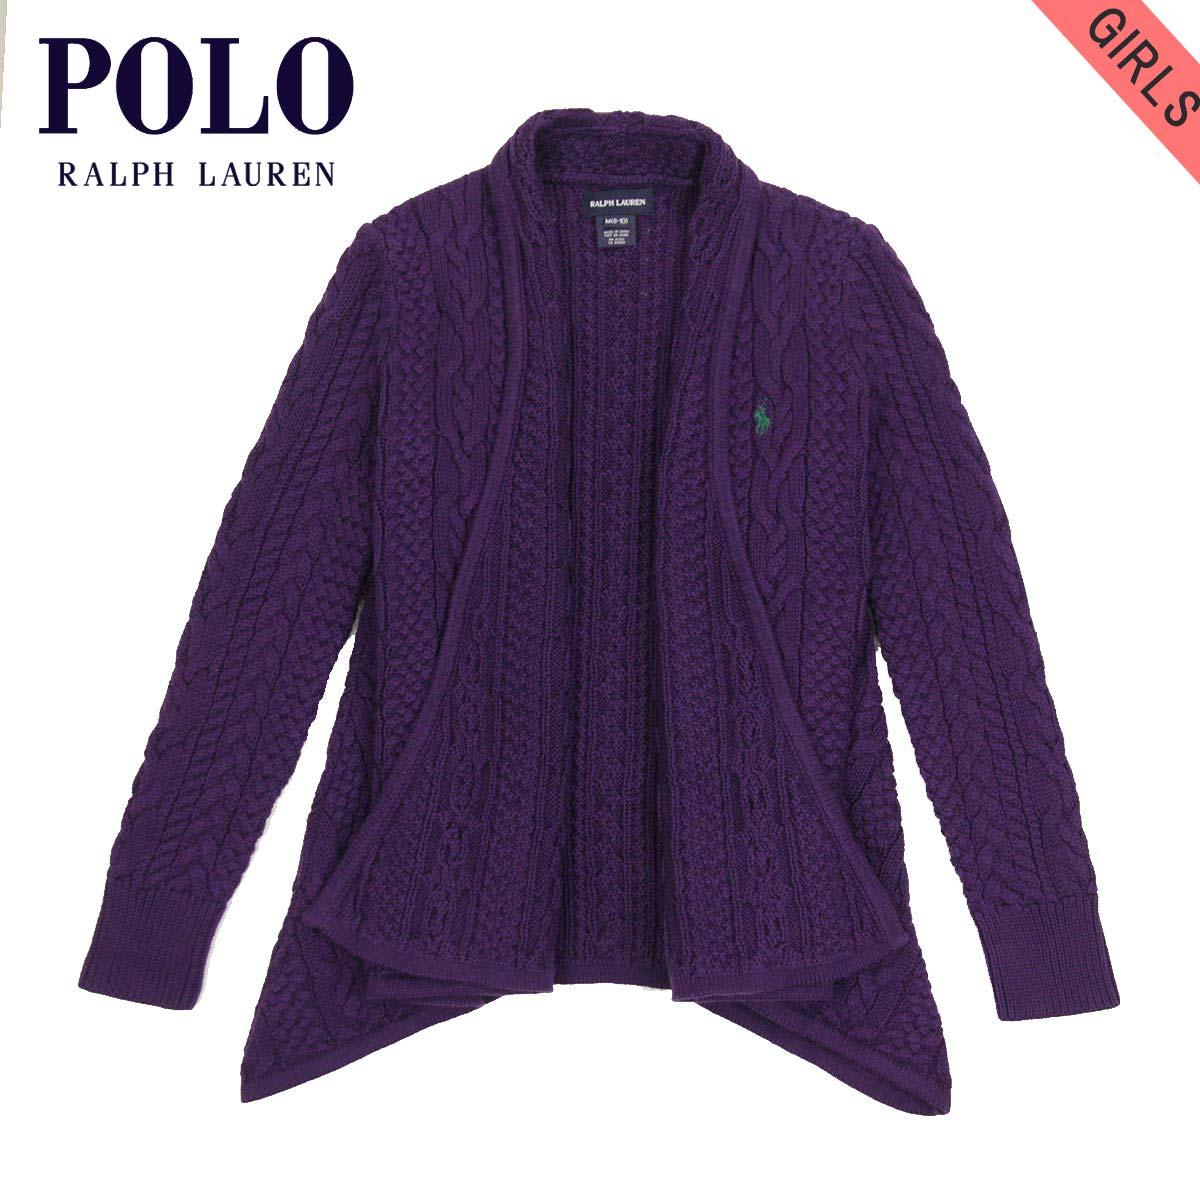 84c261e2fb Rakuten Ichiba shop MIXON: Polo Ralph Lauren kids sweater girls ...